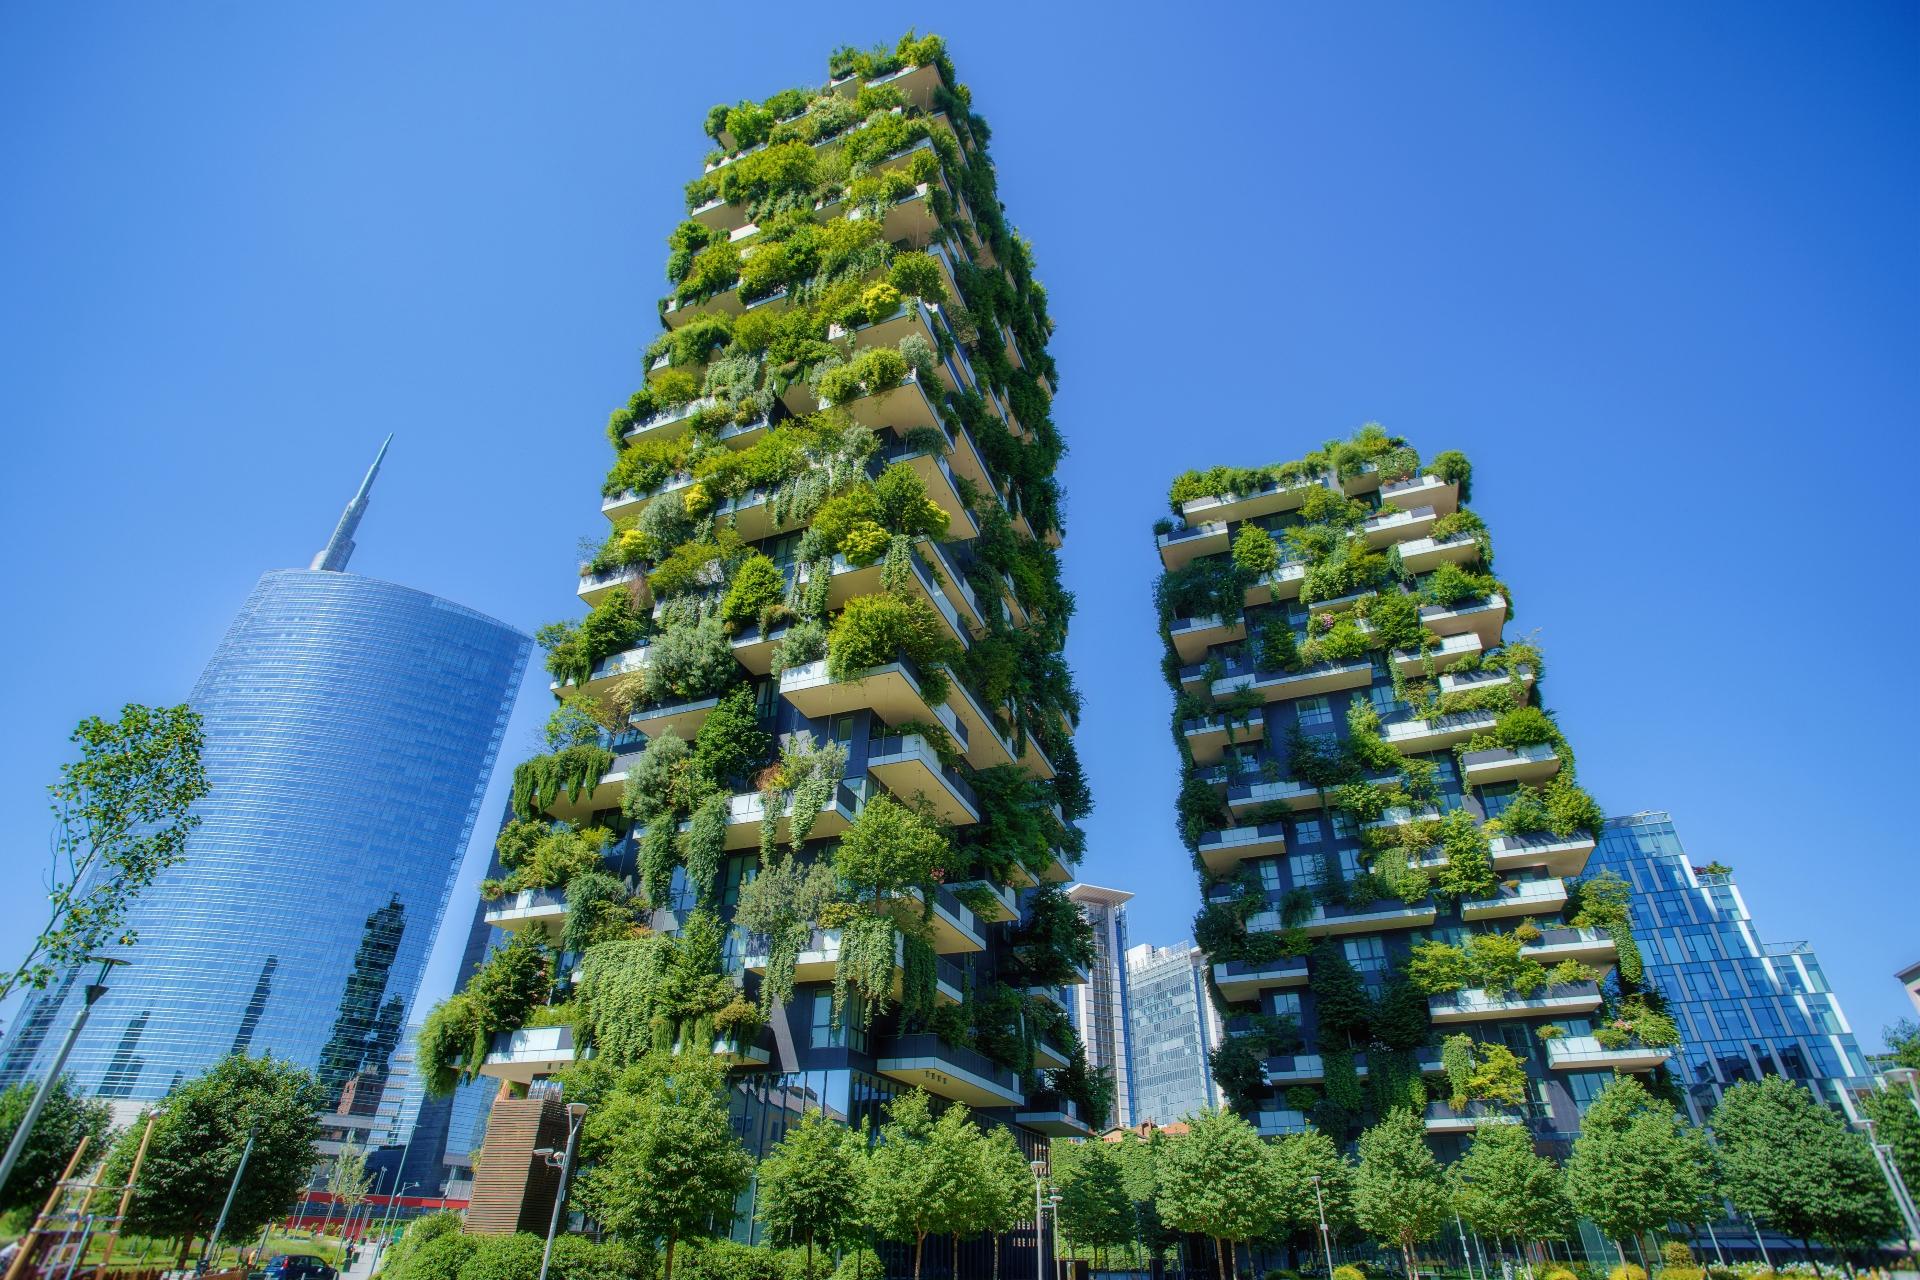 Проект Bosco Verticale в Милане